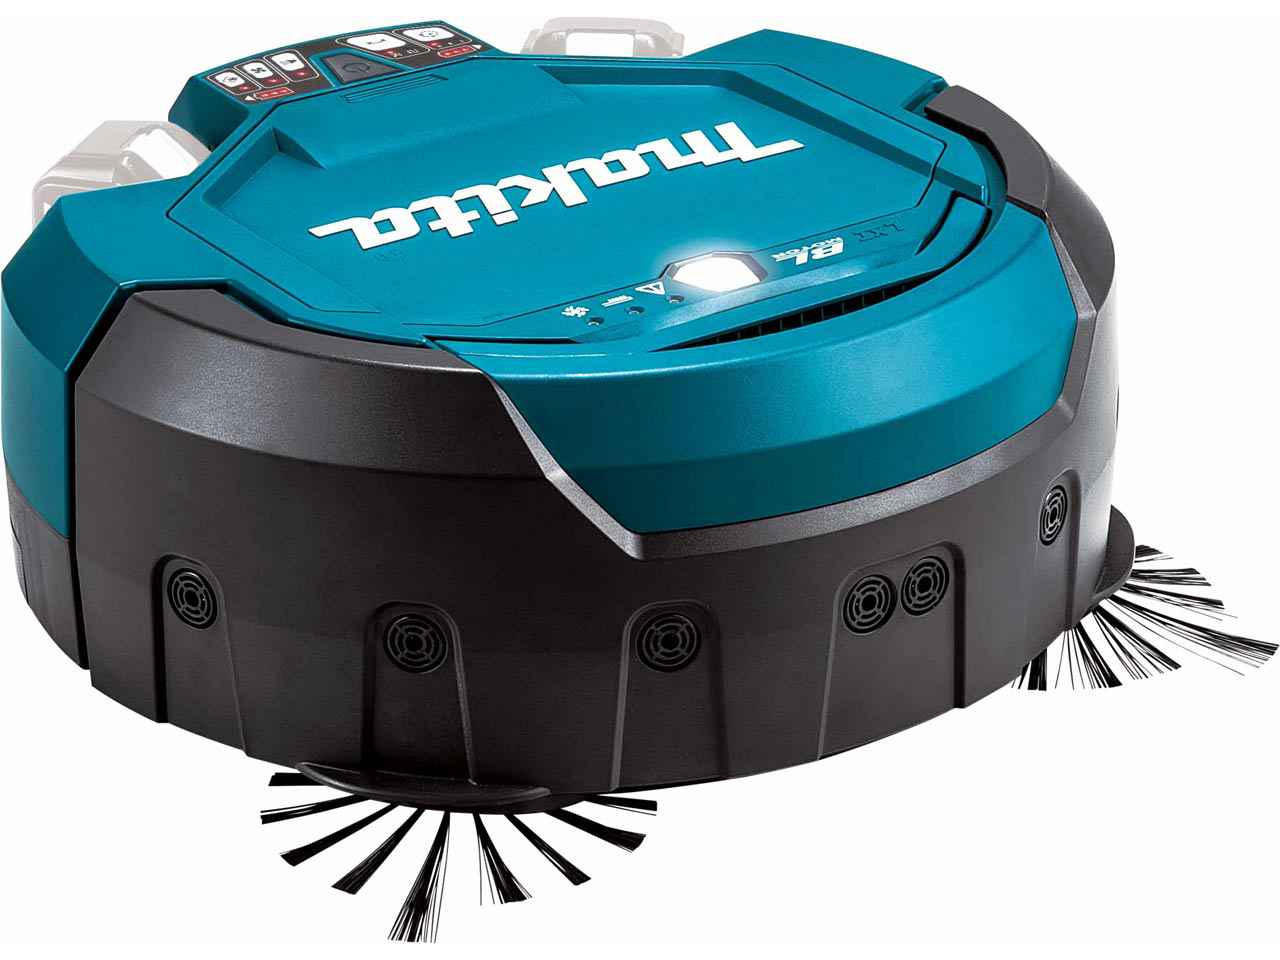 Makita drc200z twin 18v 36v lxt robotic vacuum cleaner for Robot sweepy